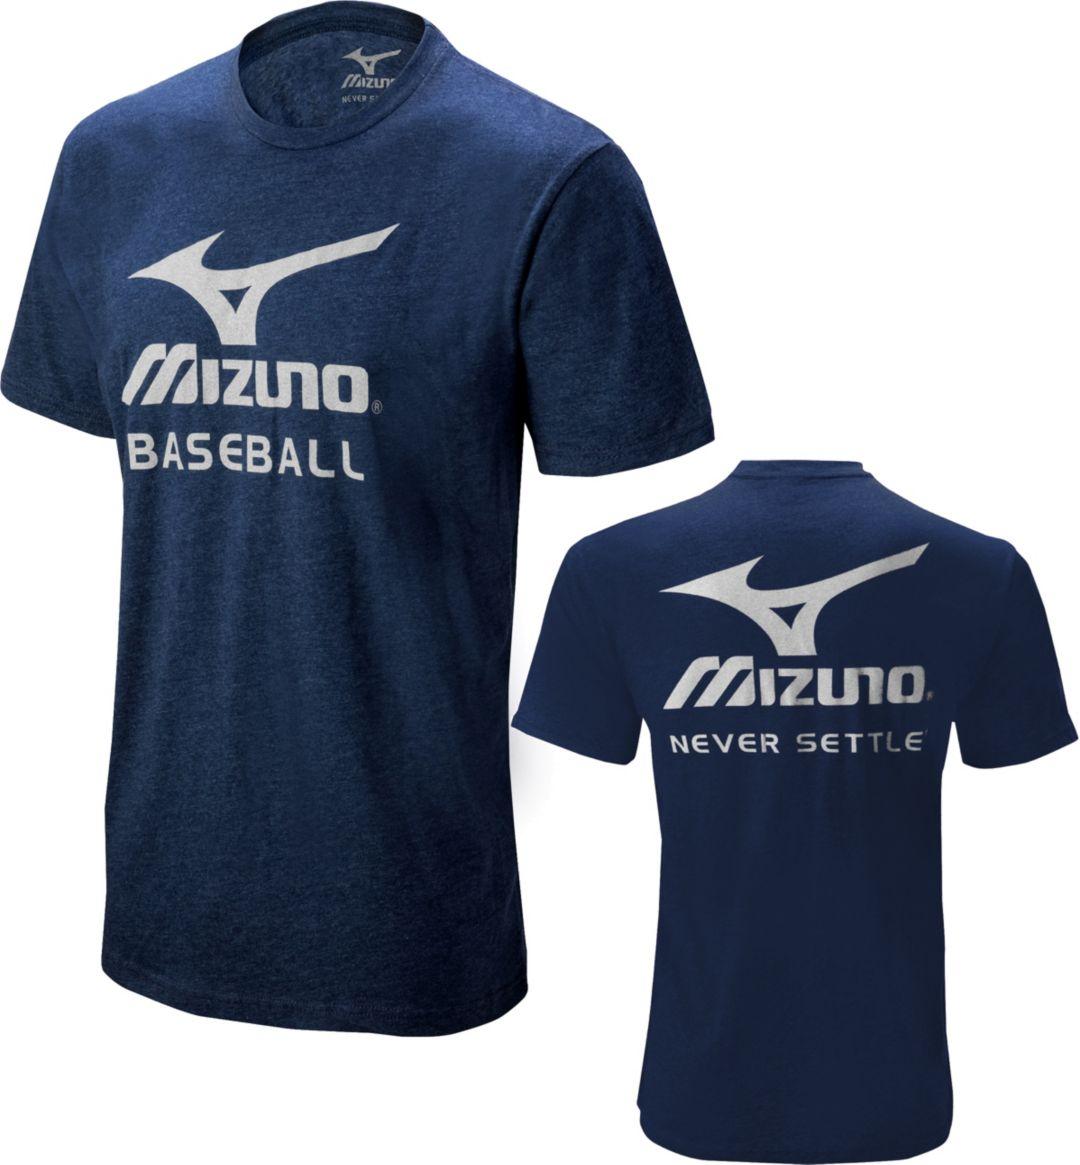 4a07f5738 Mizuno Men's Never Settle T-Shirt | DICK'S Sporting Goods